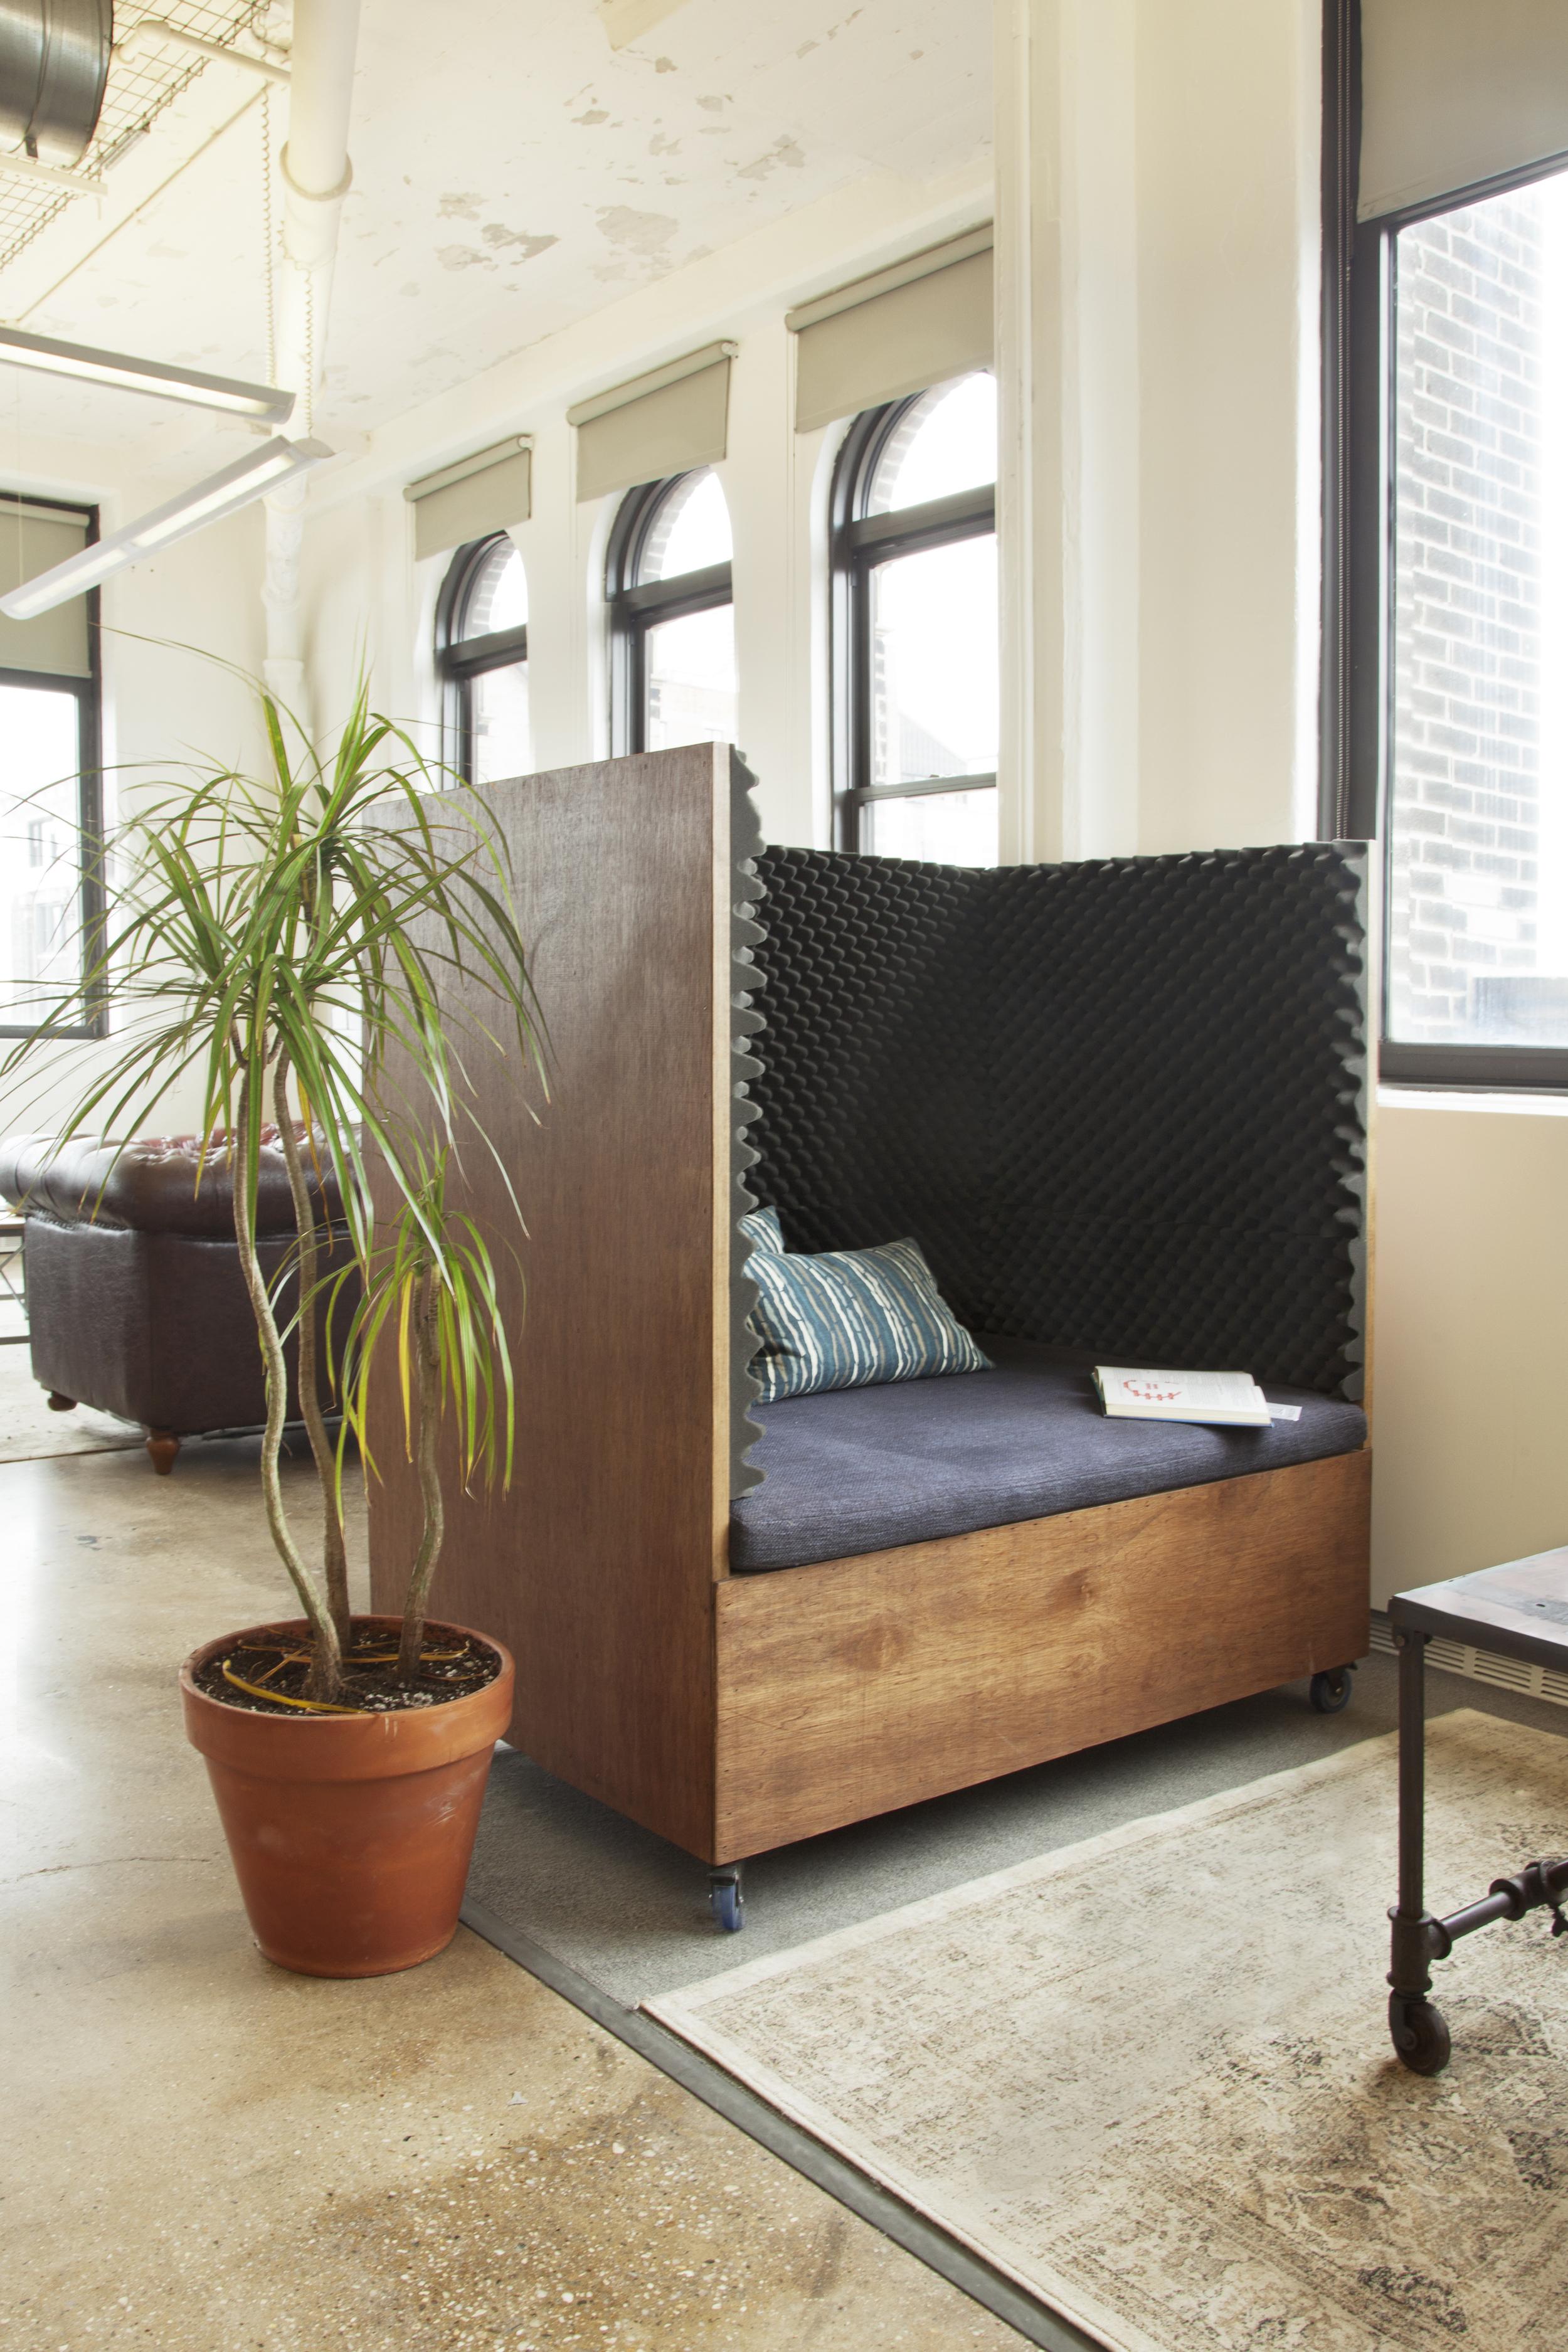 Dani Lounge in Sailthru's office.